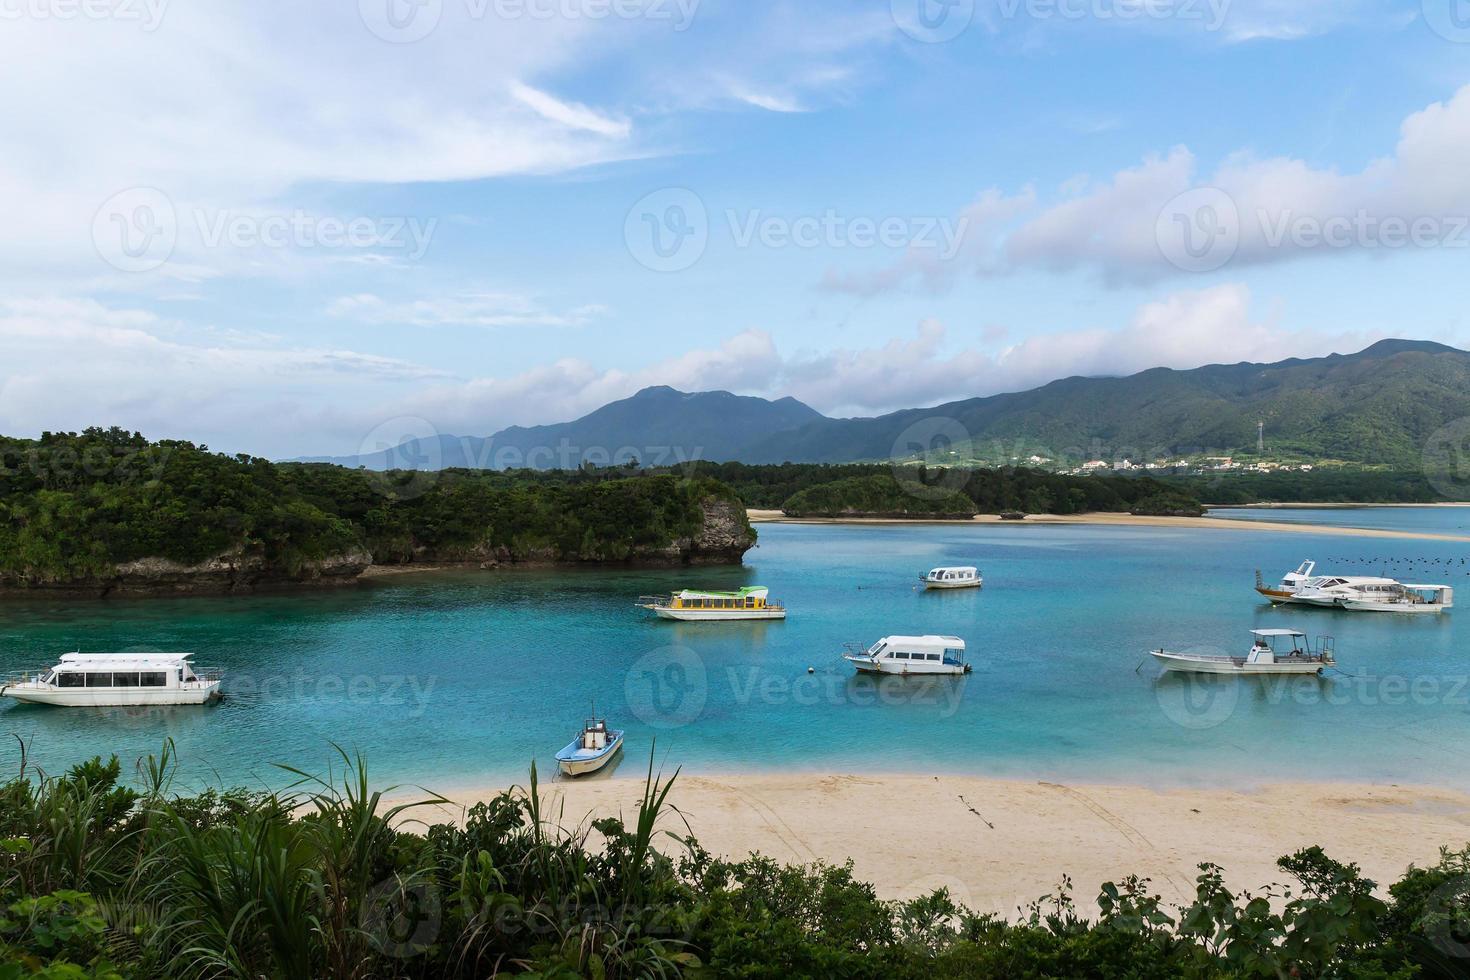 Kabira Bay på Ishigaki Island, Okinawa Japan foto